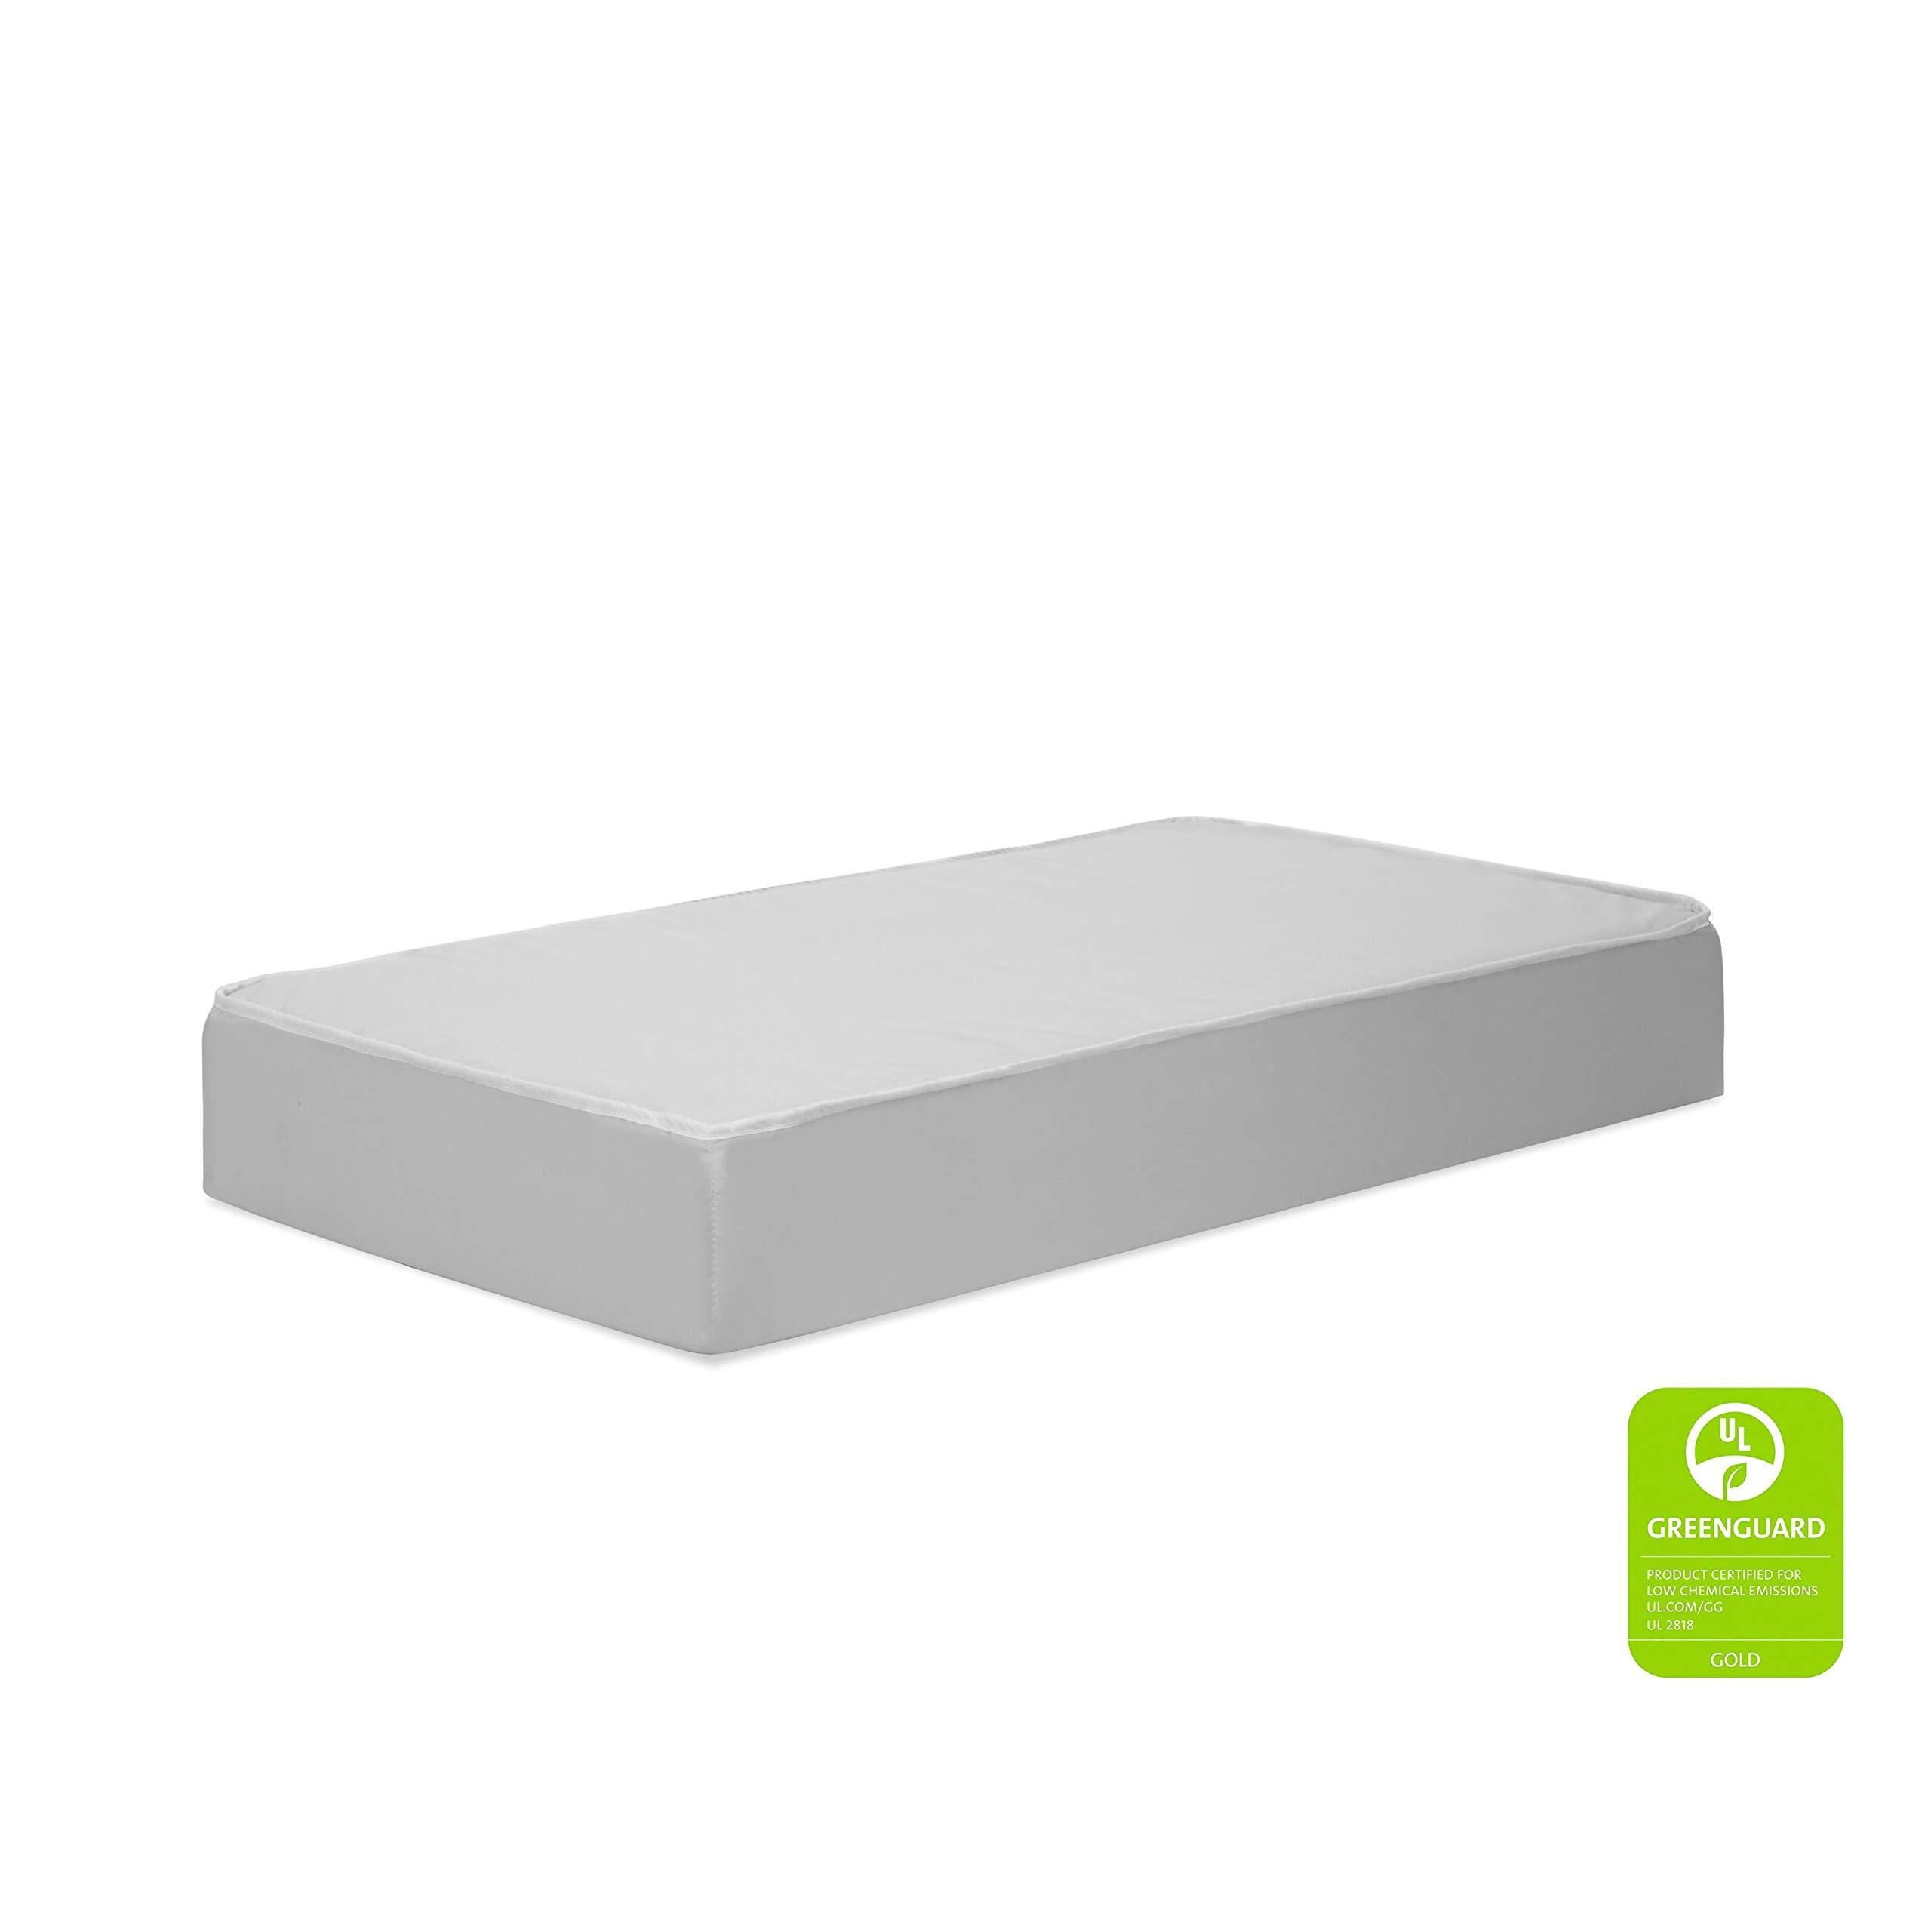 DaVinci Complete Slumber Waterproof MINI Crib Mattress | Firm Support | GREENGUARD Gold Certified | Lightweight | 100% Non-Toxic by DaVinci